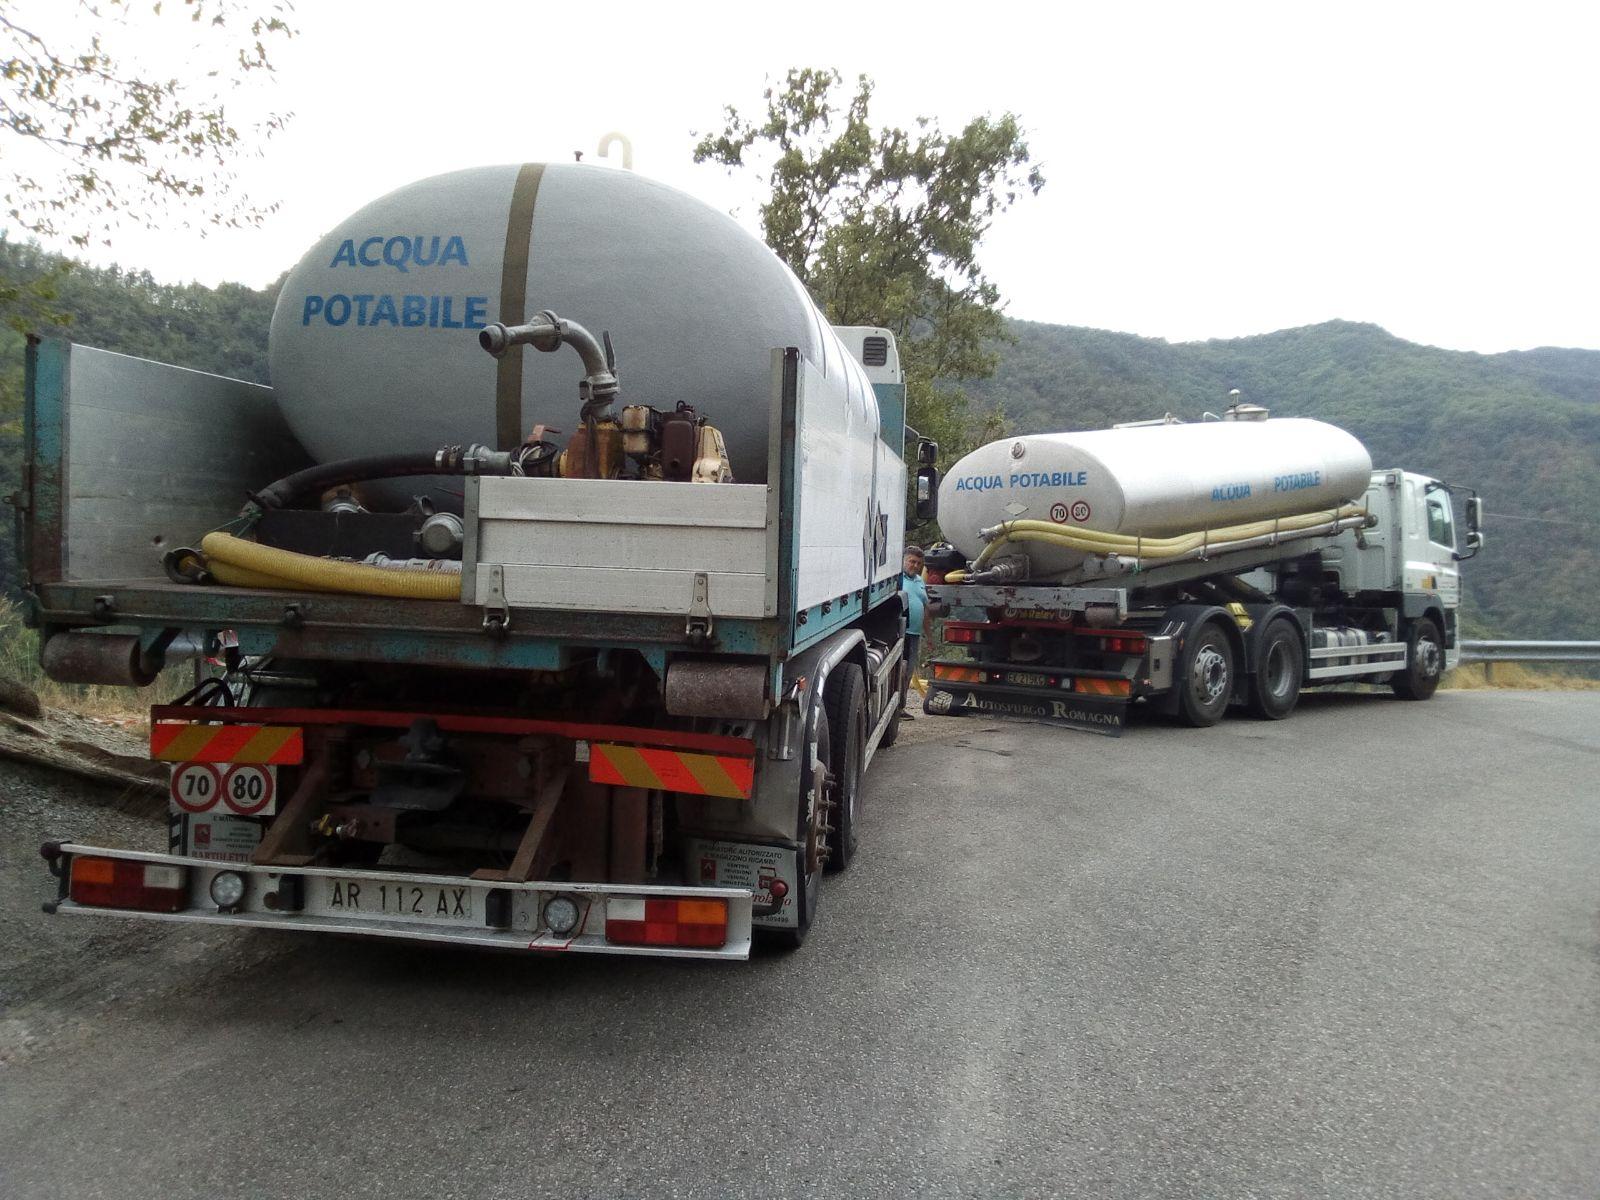 rimini-trasporto-acqua-potabile